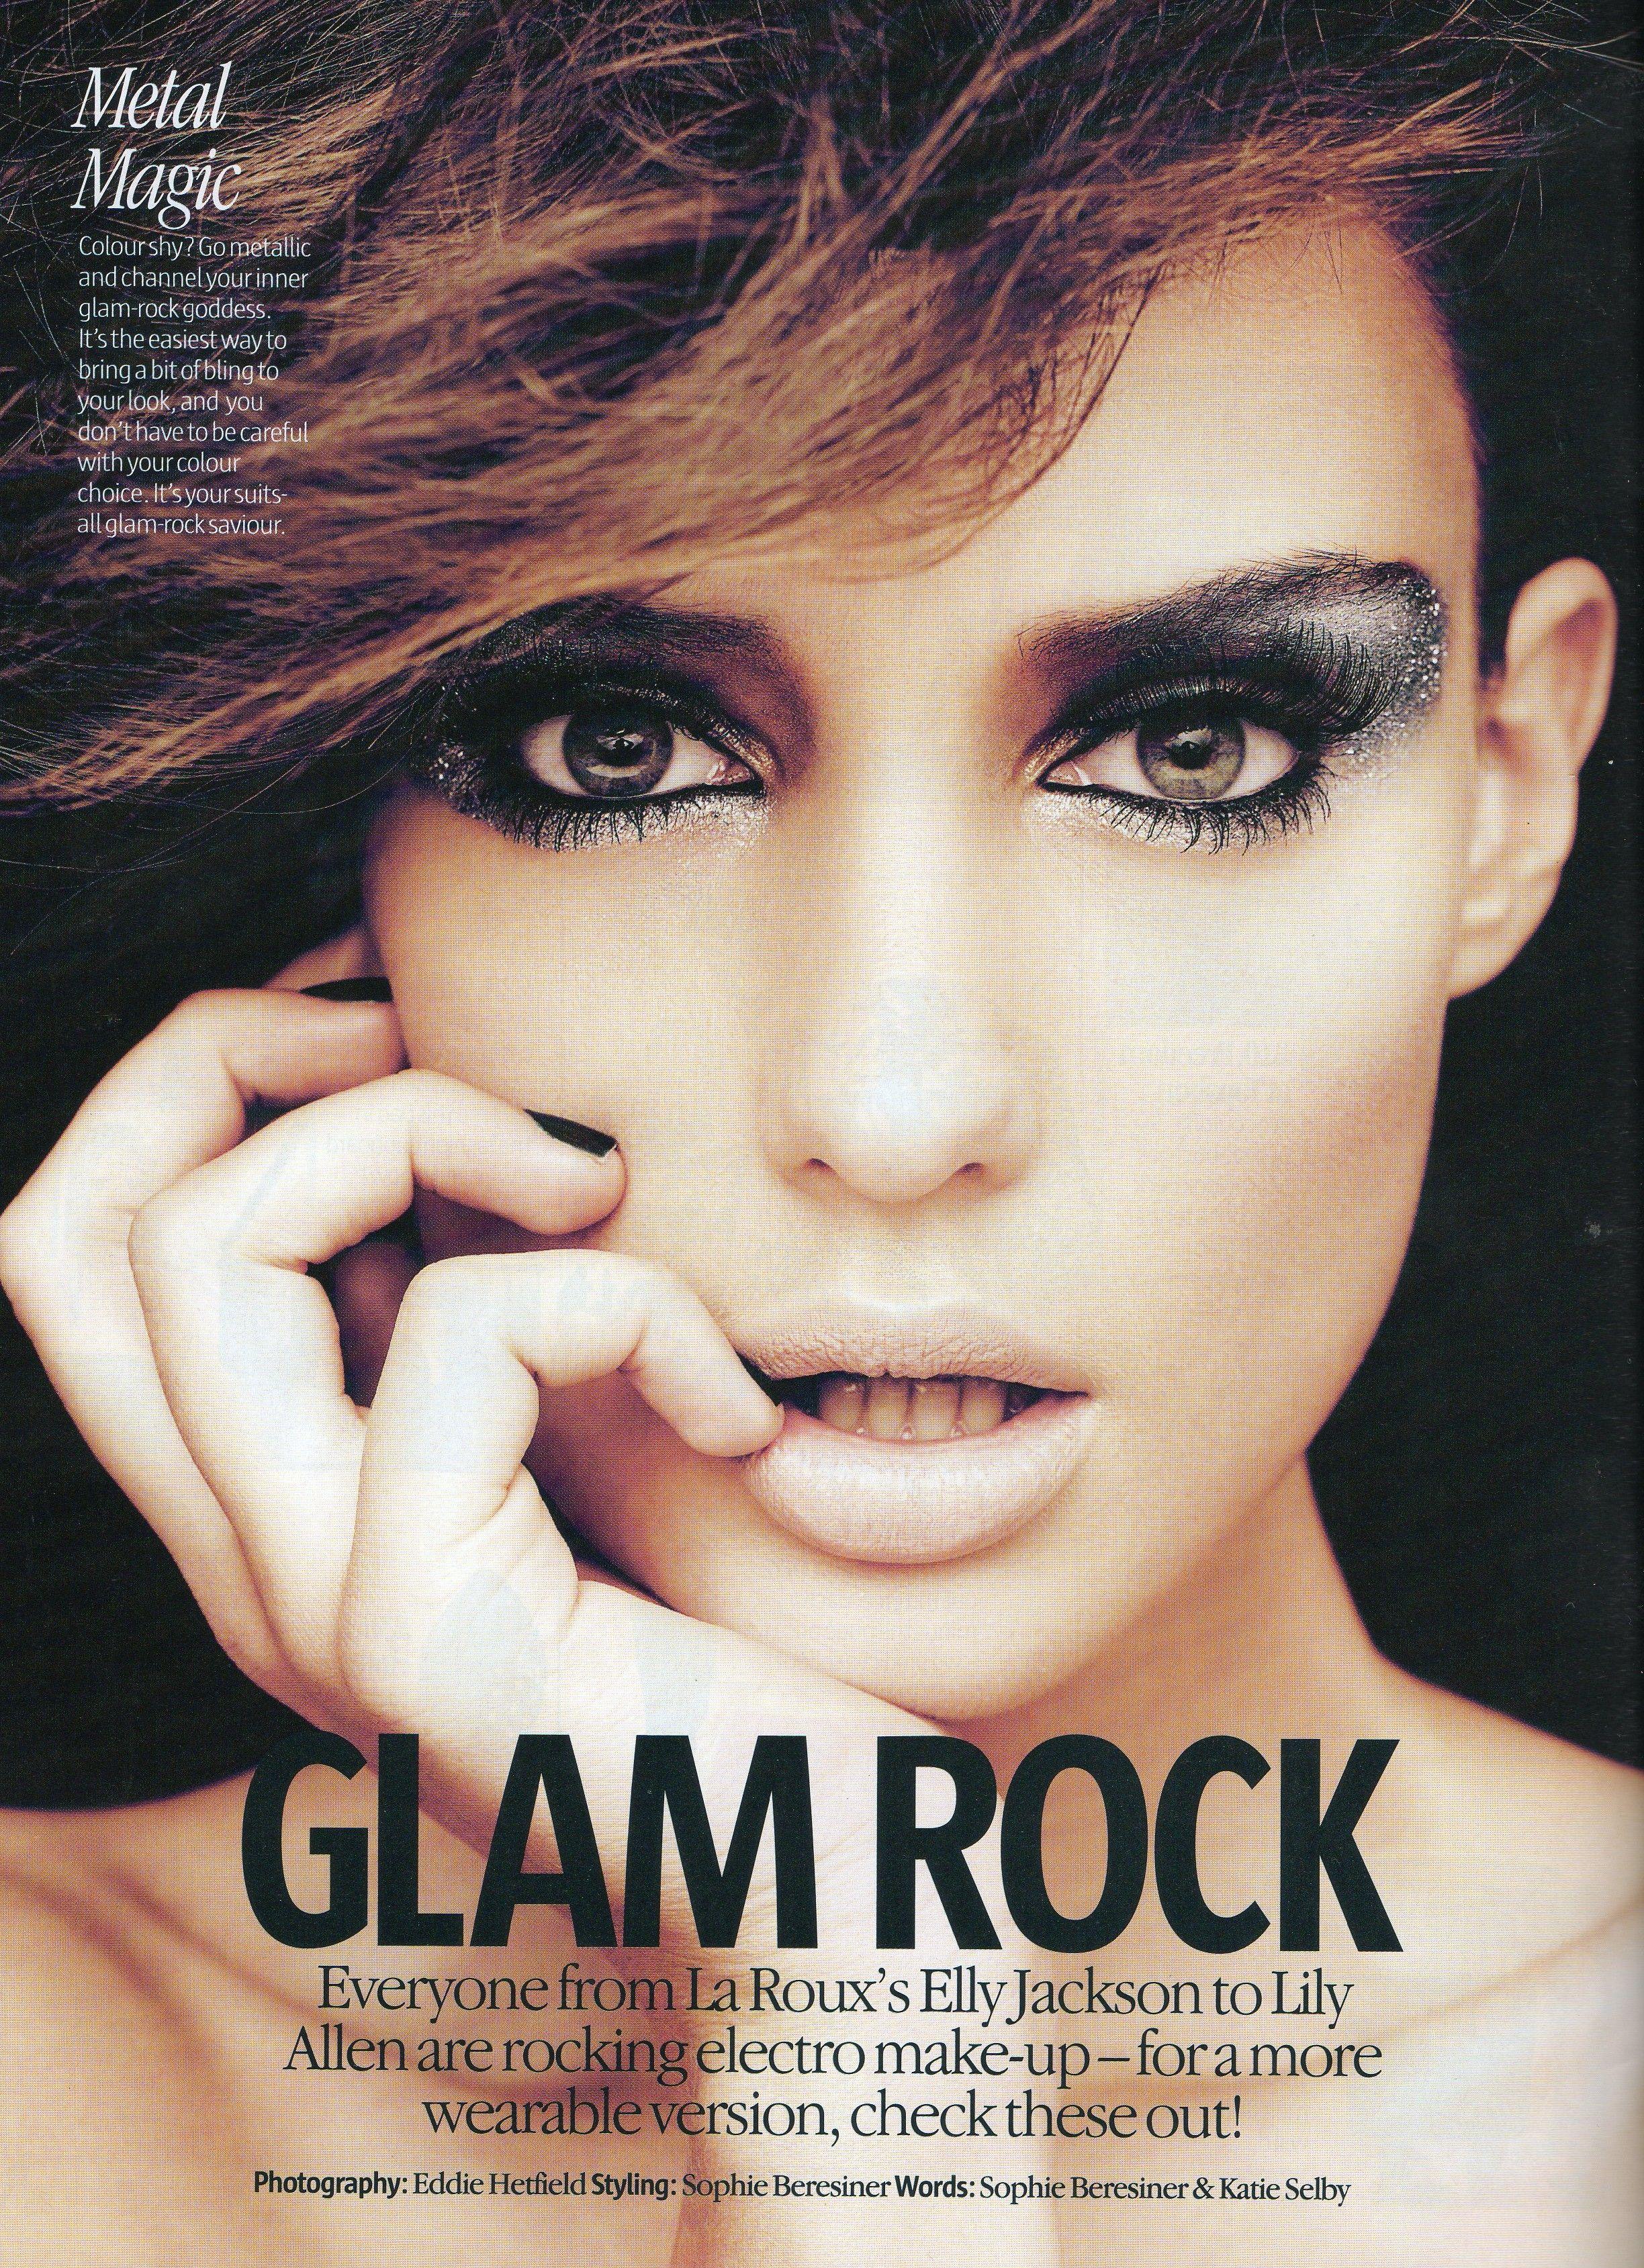 Glam Rock Glam Rock Makeup Rock Makeup Glam Rock Style